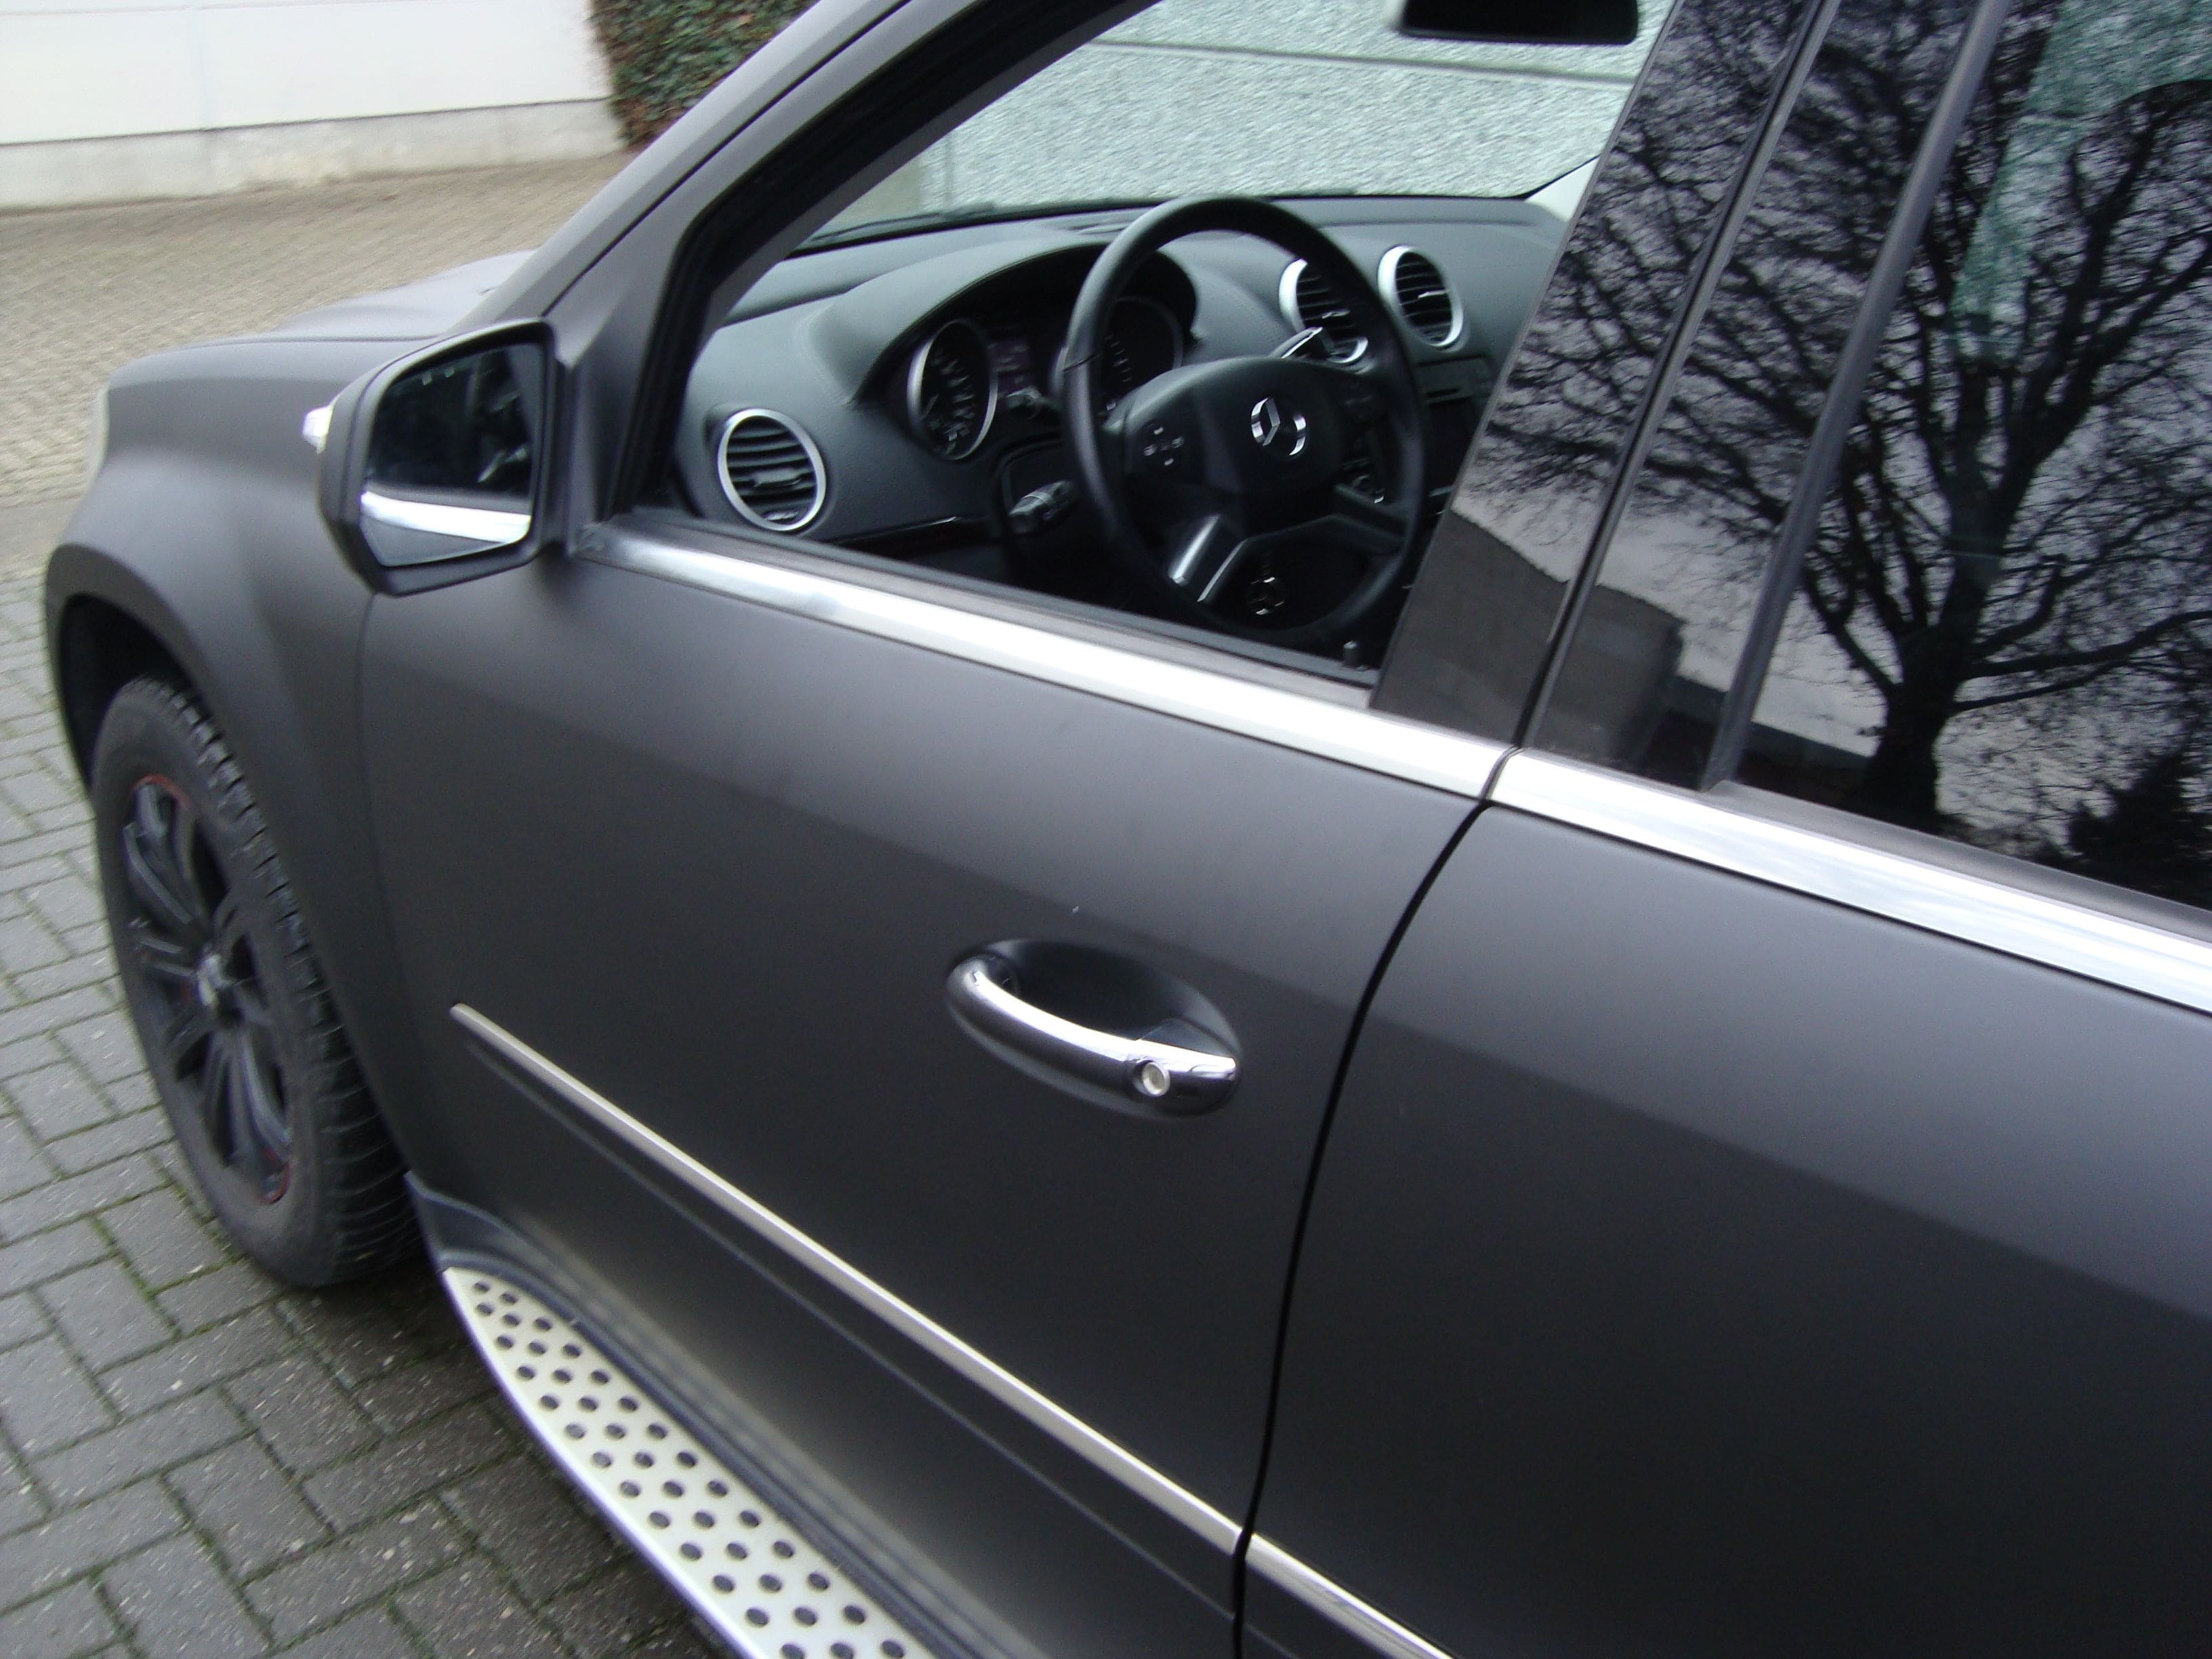 Mercedes GL met Mat Zwarte Wrap, Carwrapping door Wrapmyride.nu Foto-nr:6284, ©2020